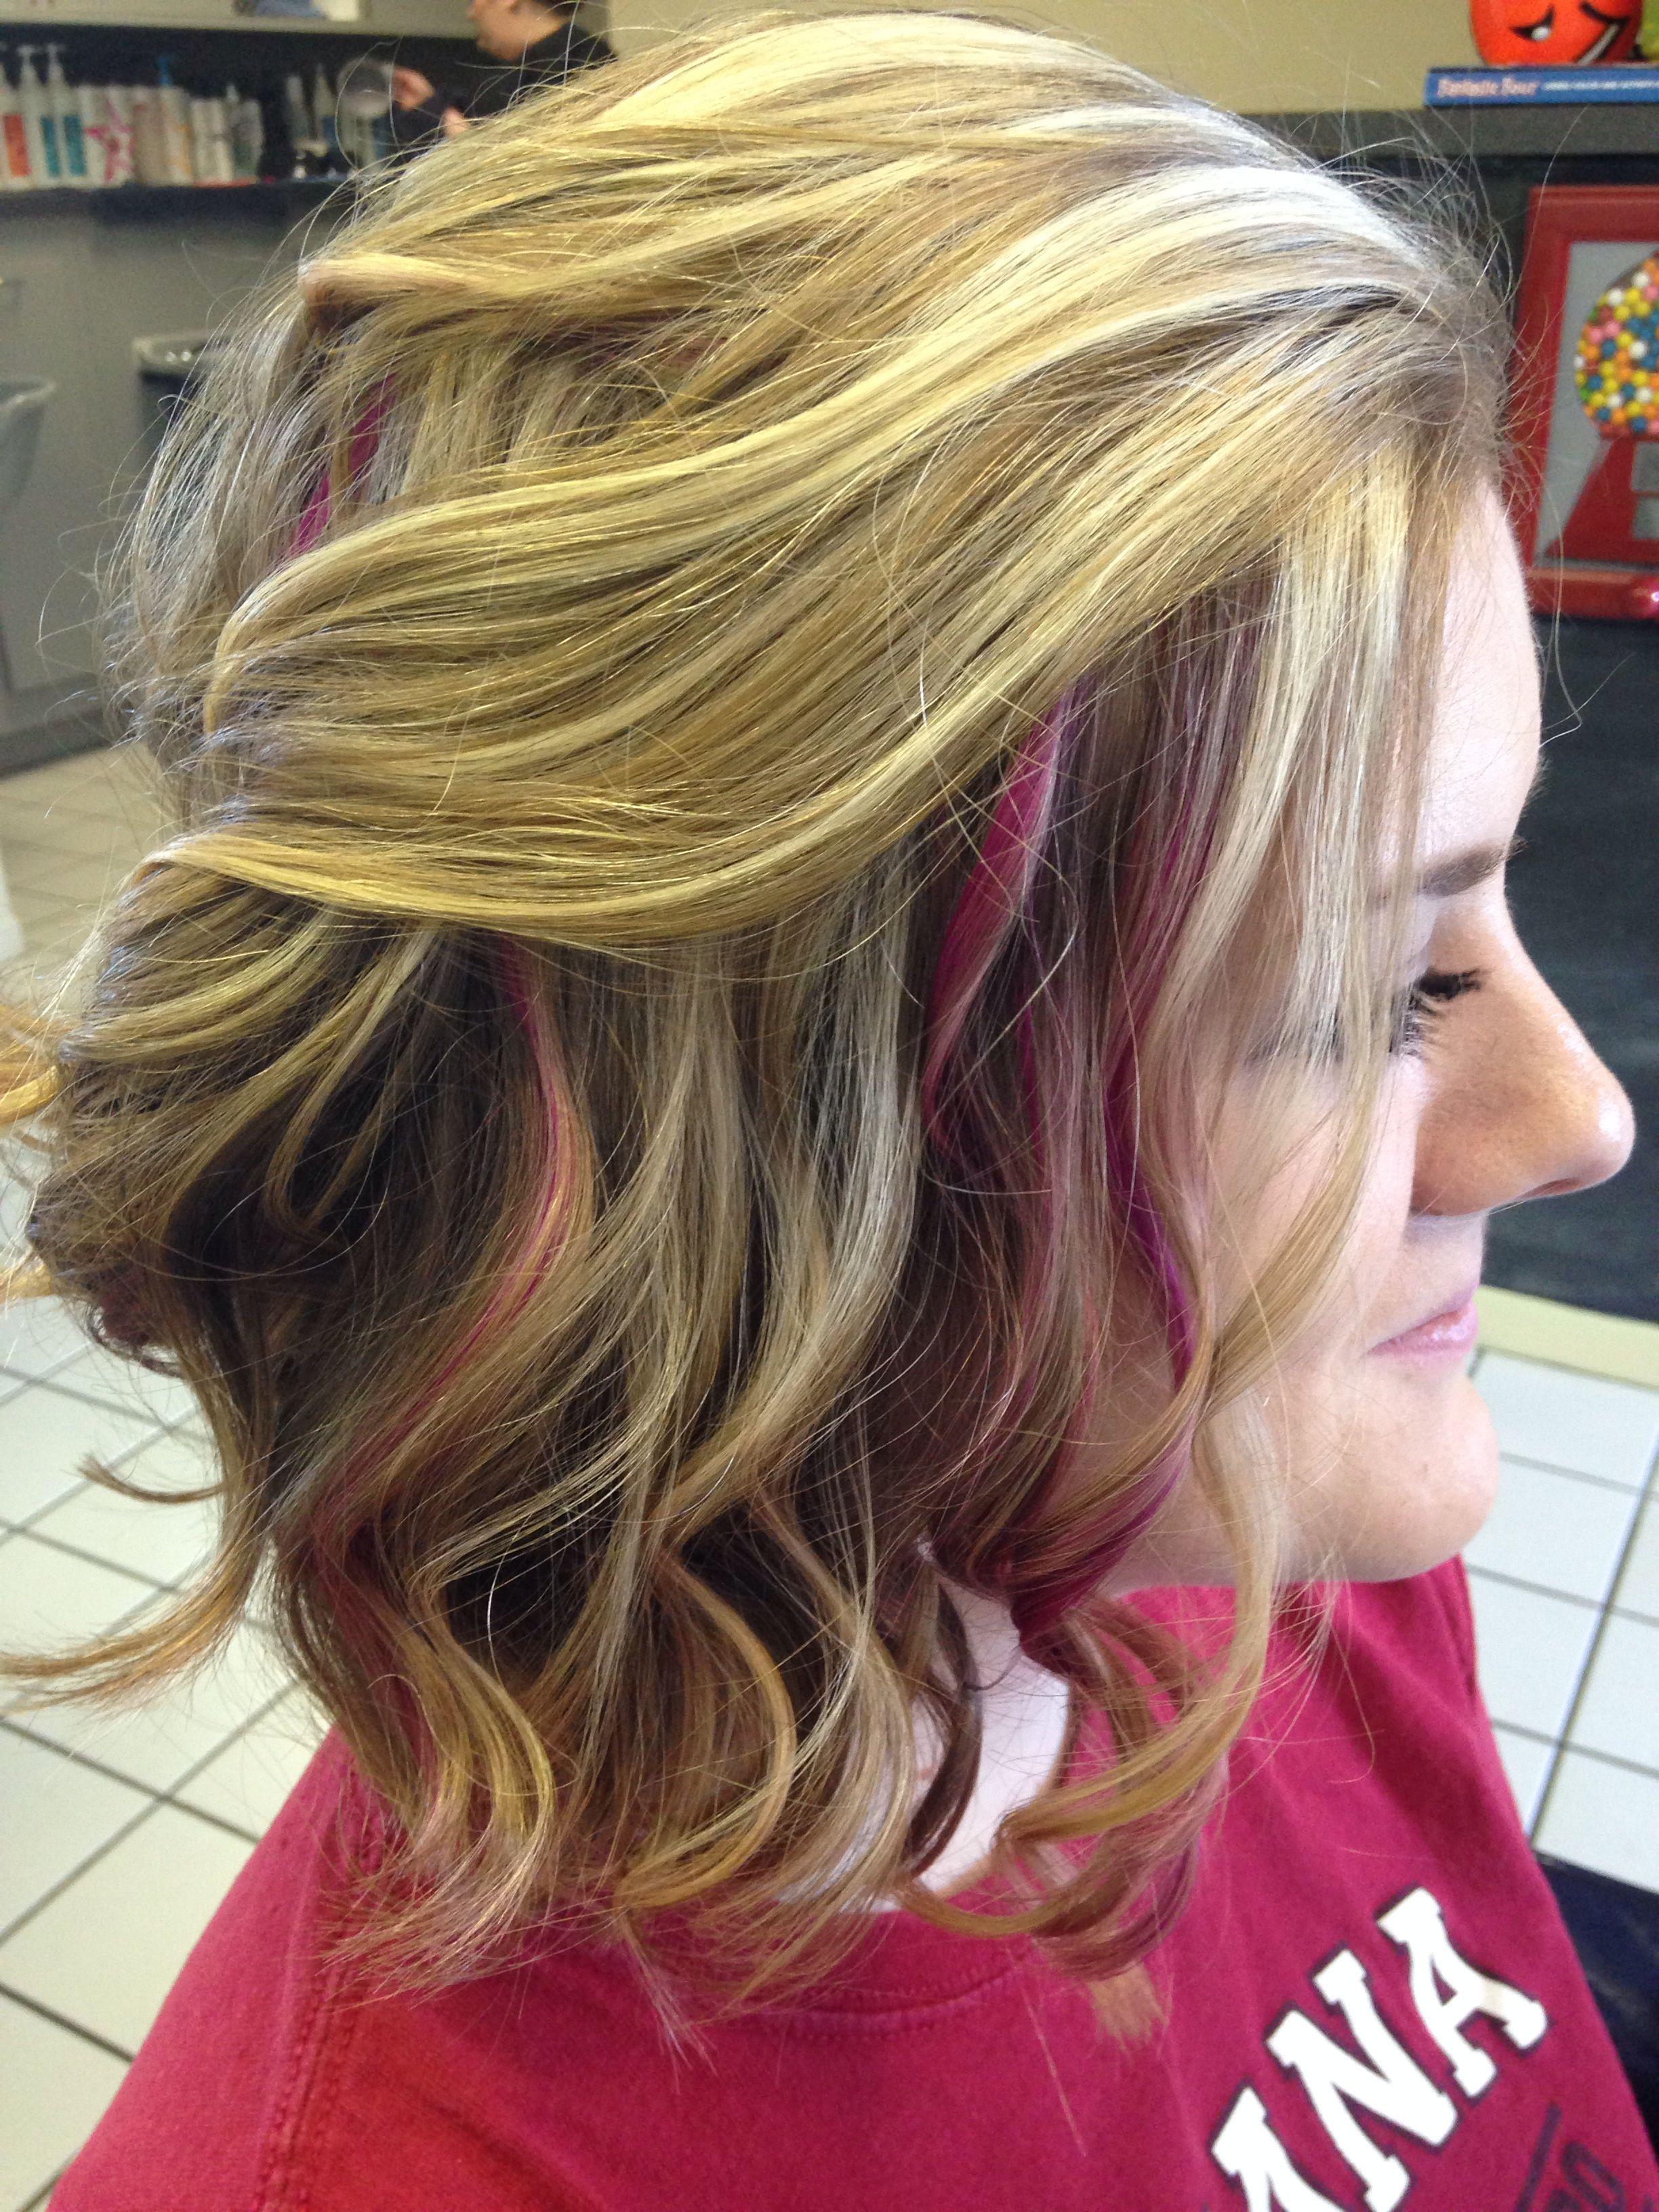 Long Bob With Curls Pink Peek A Boo Highlights Salon A Go Go Long Bob With Curls Burgandy Short Hair Peekaboo Hair